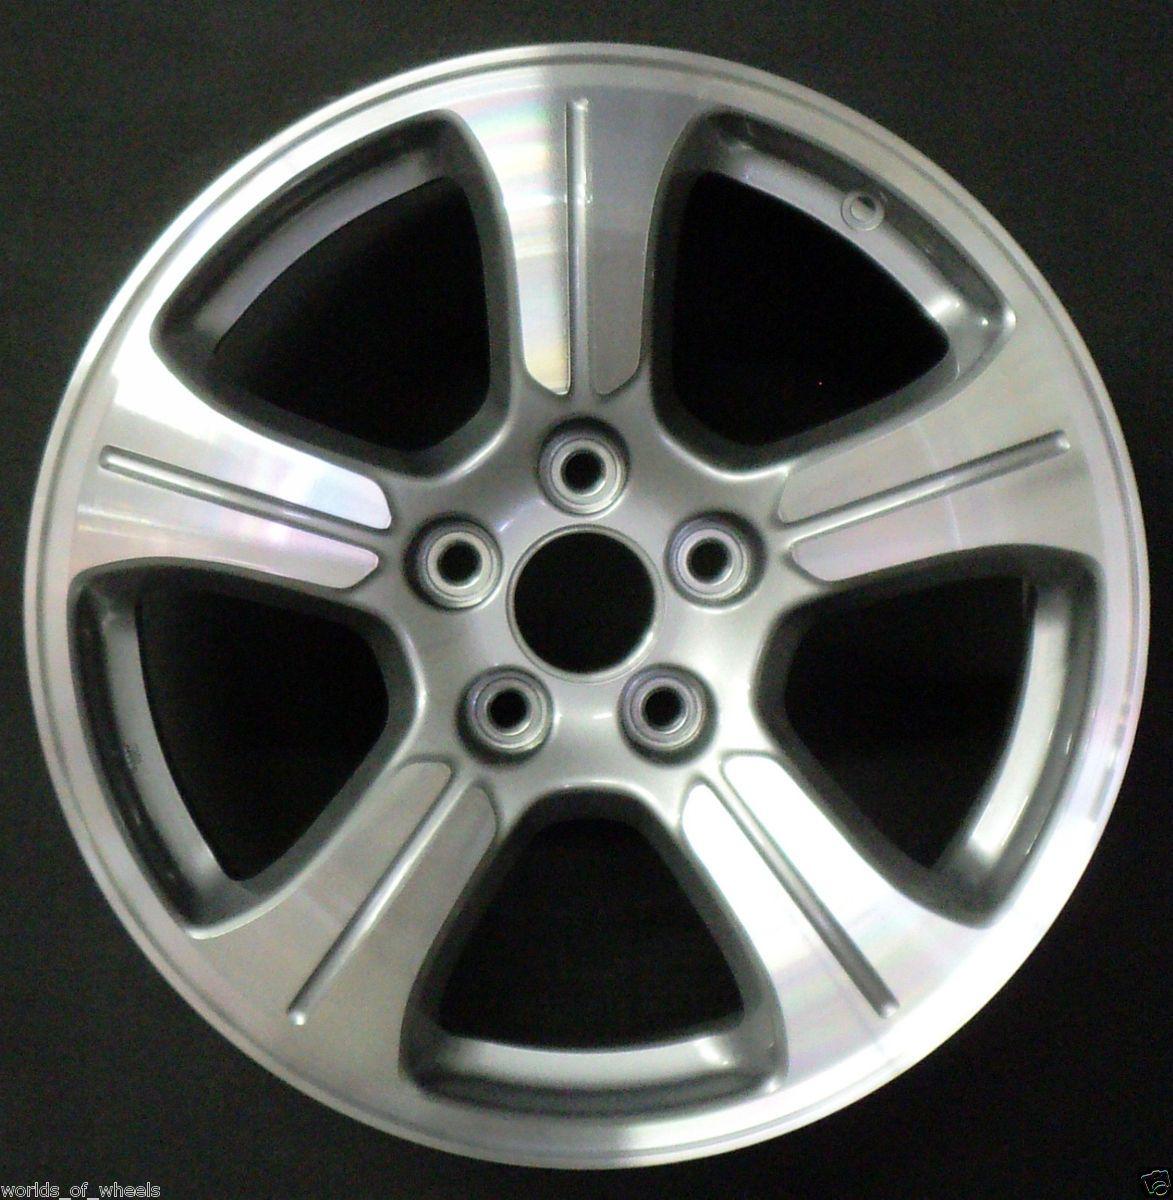 2012 Honda Pilot 18 5 Spoke Machined And Silver Factory OEM Wheel Rim